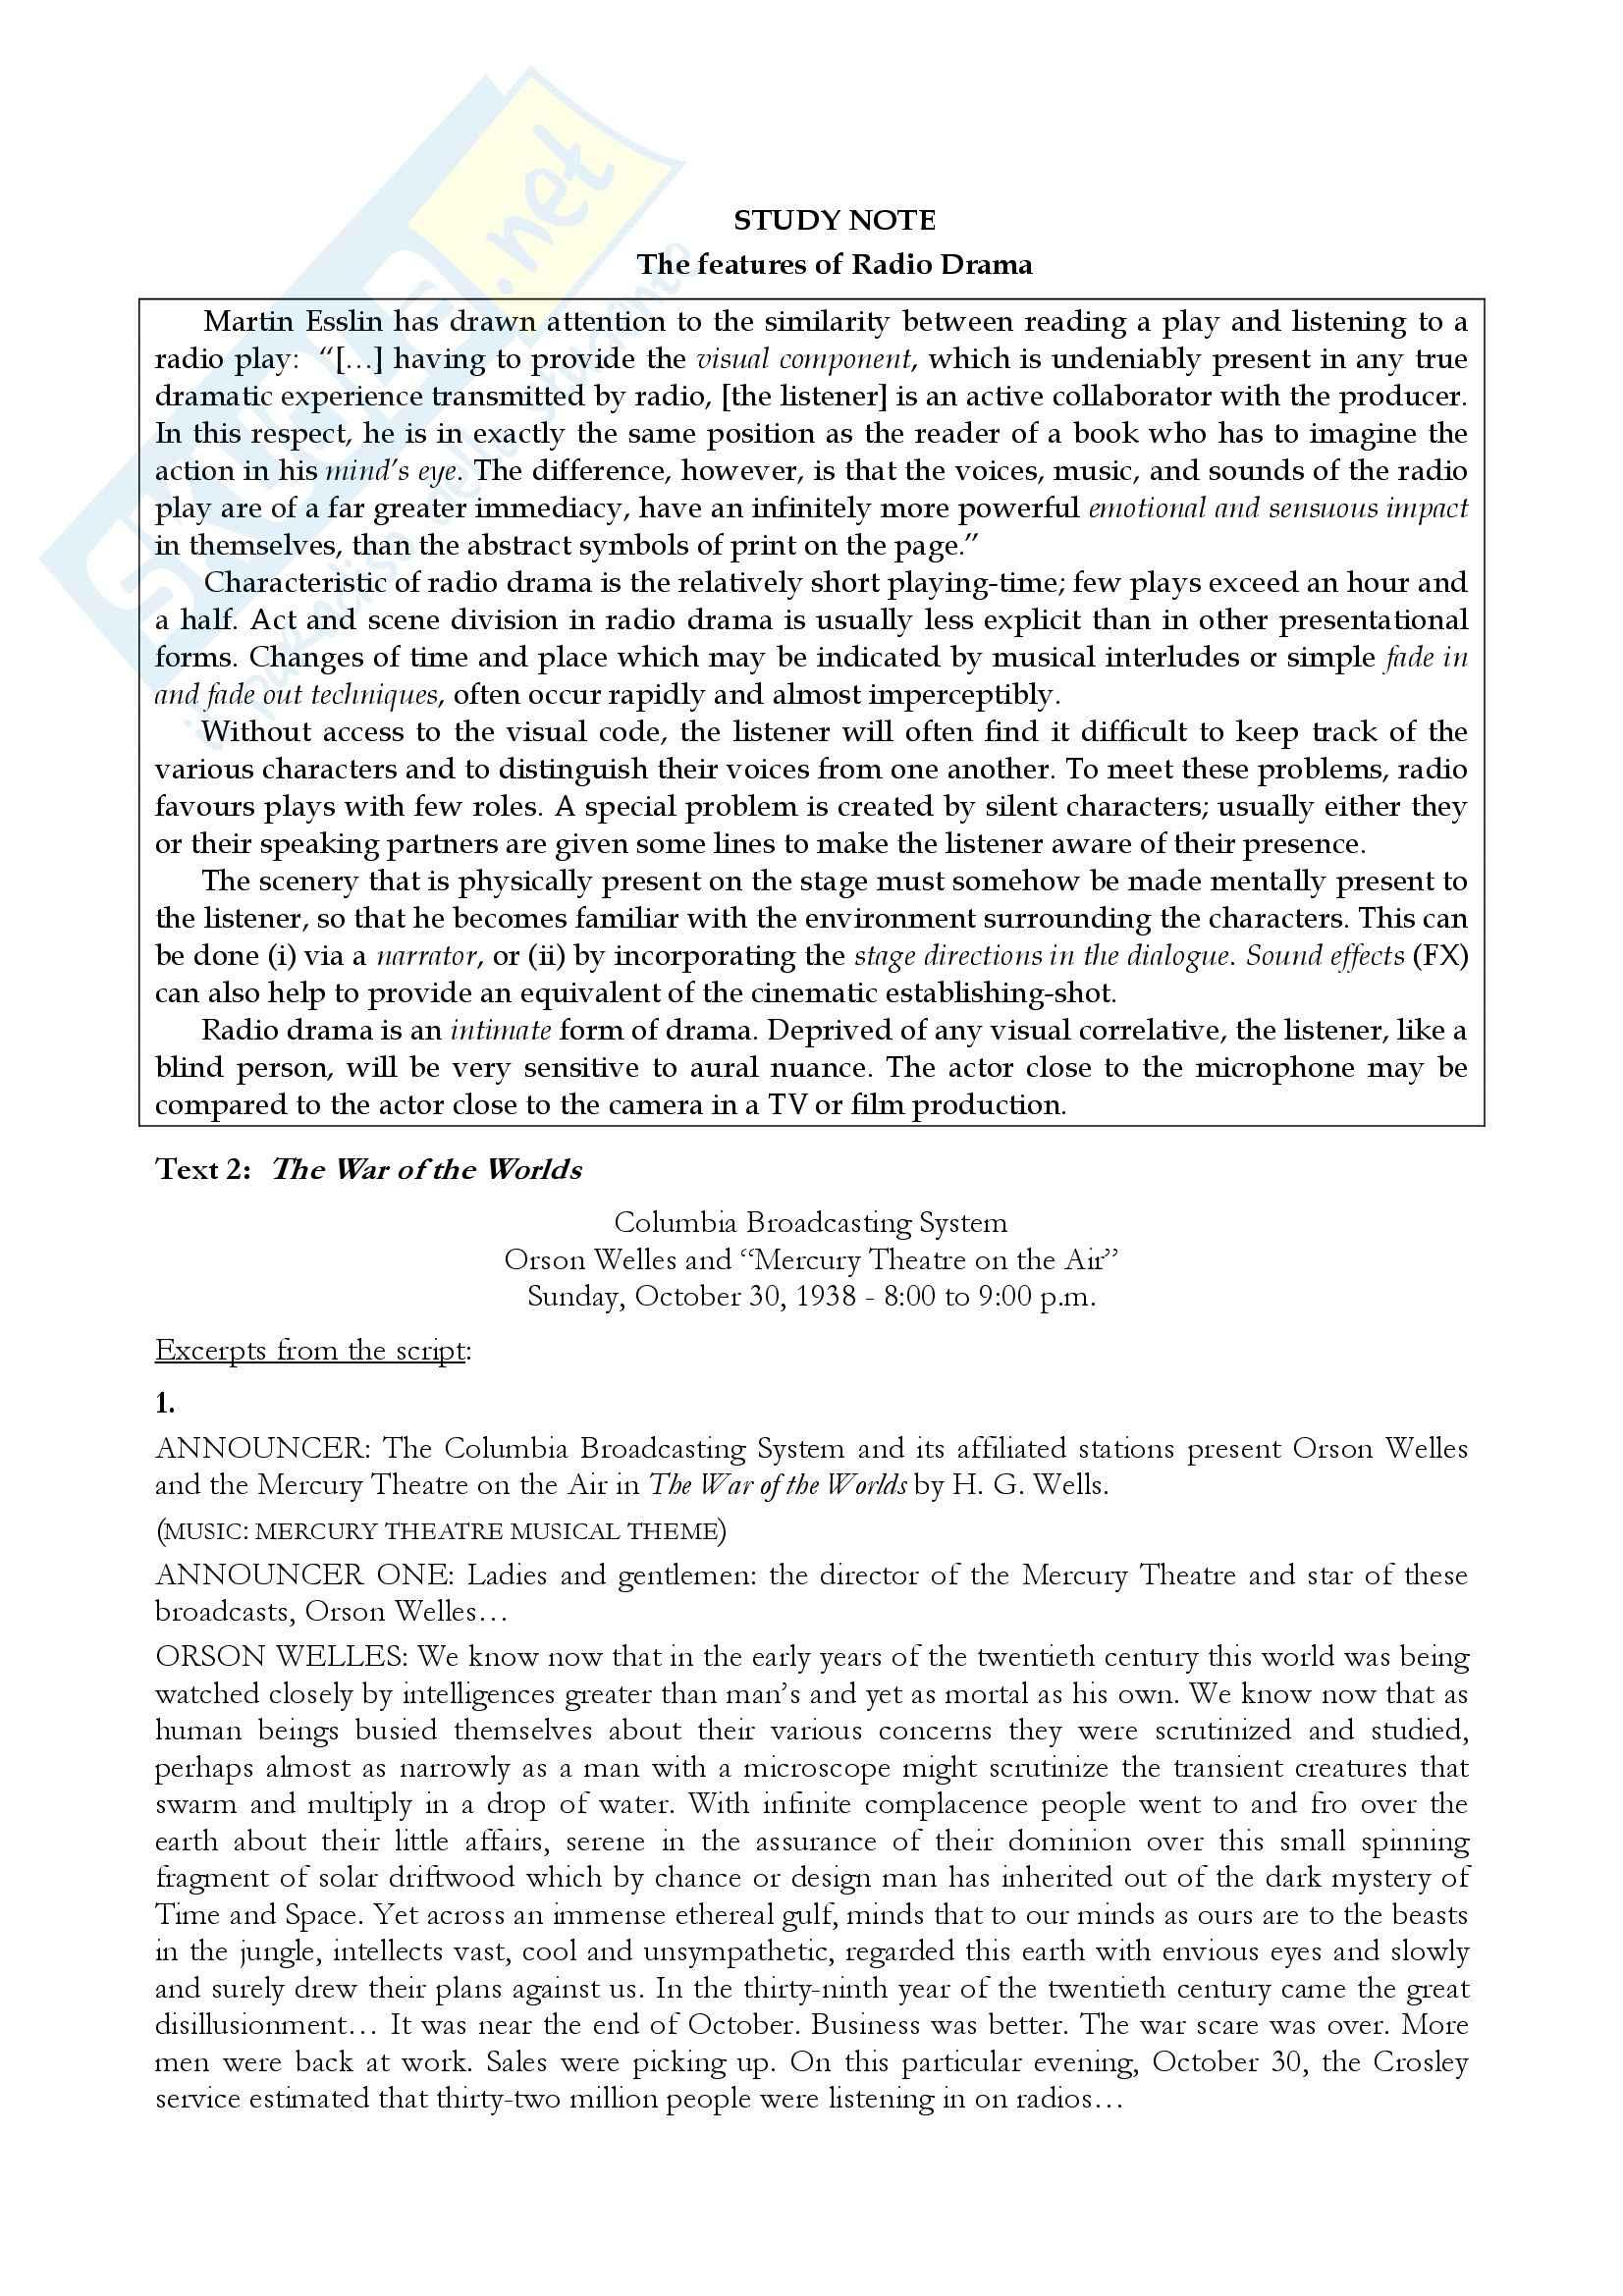 Completamento testi Pag. 6